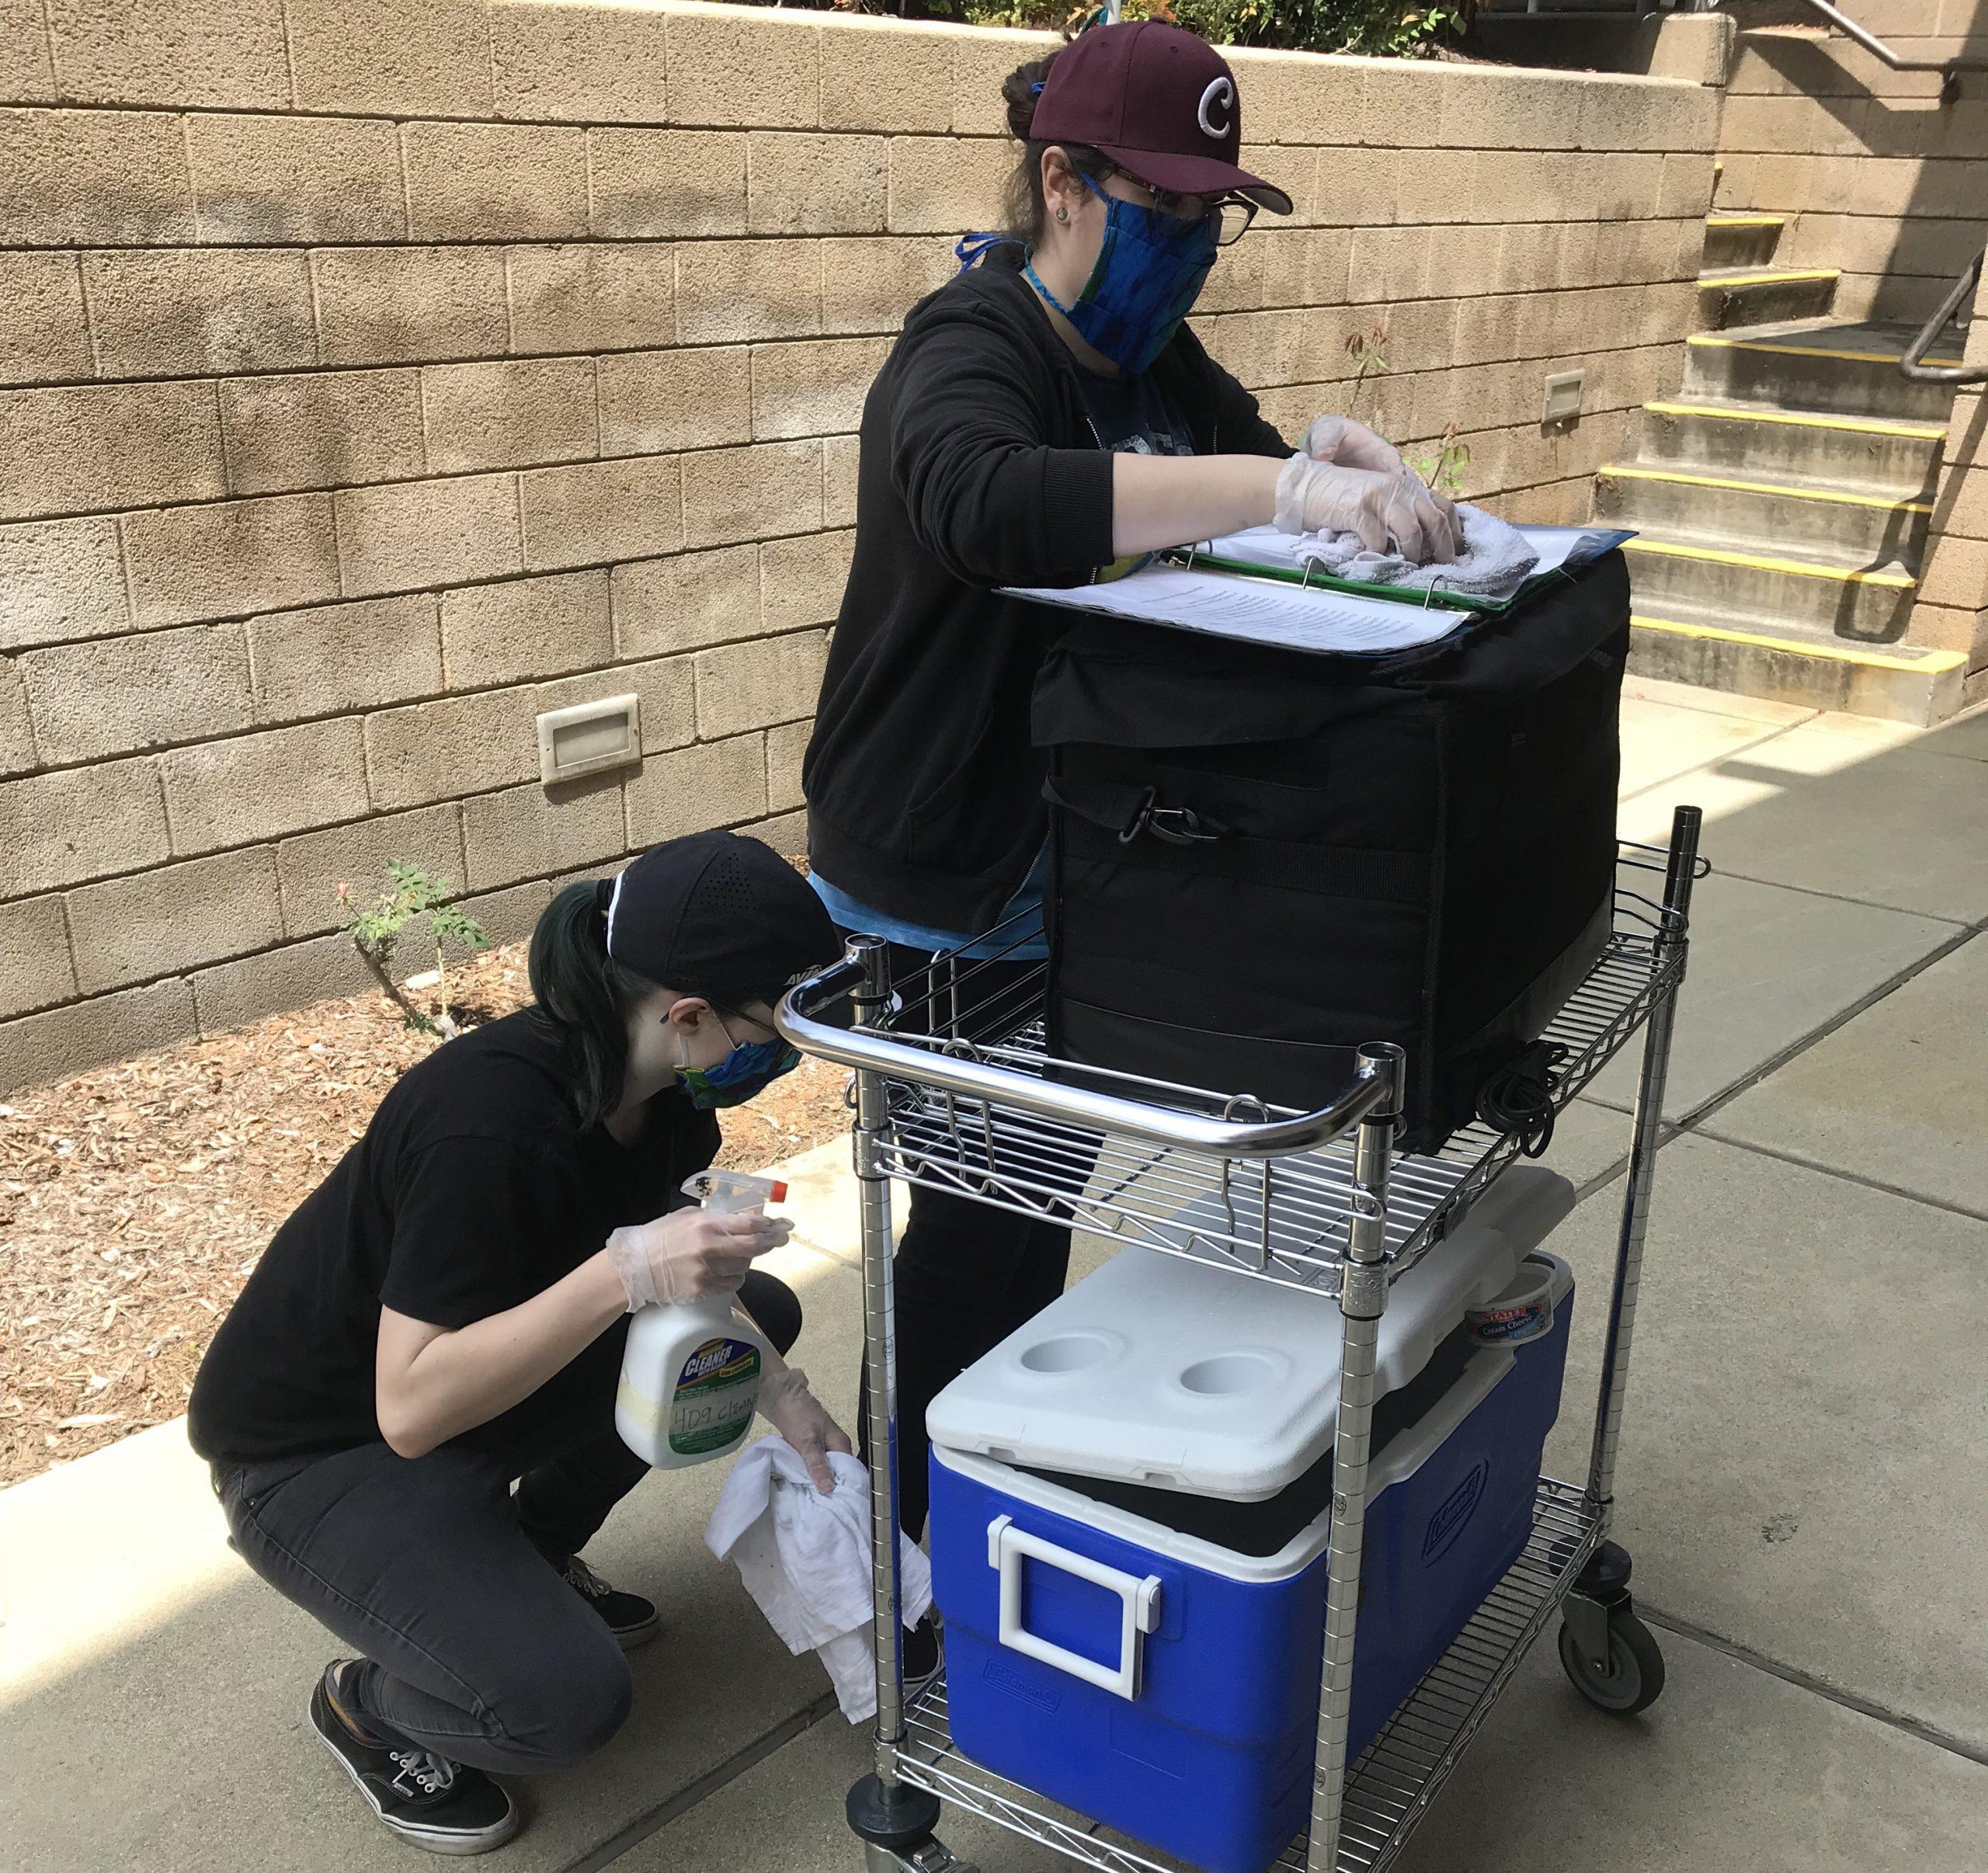 Volunteers sanitizing cooler and bag